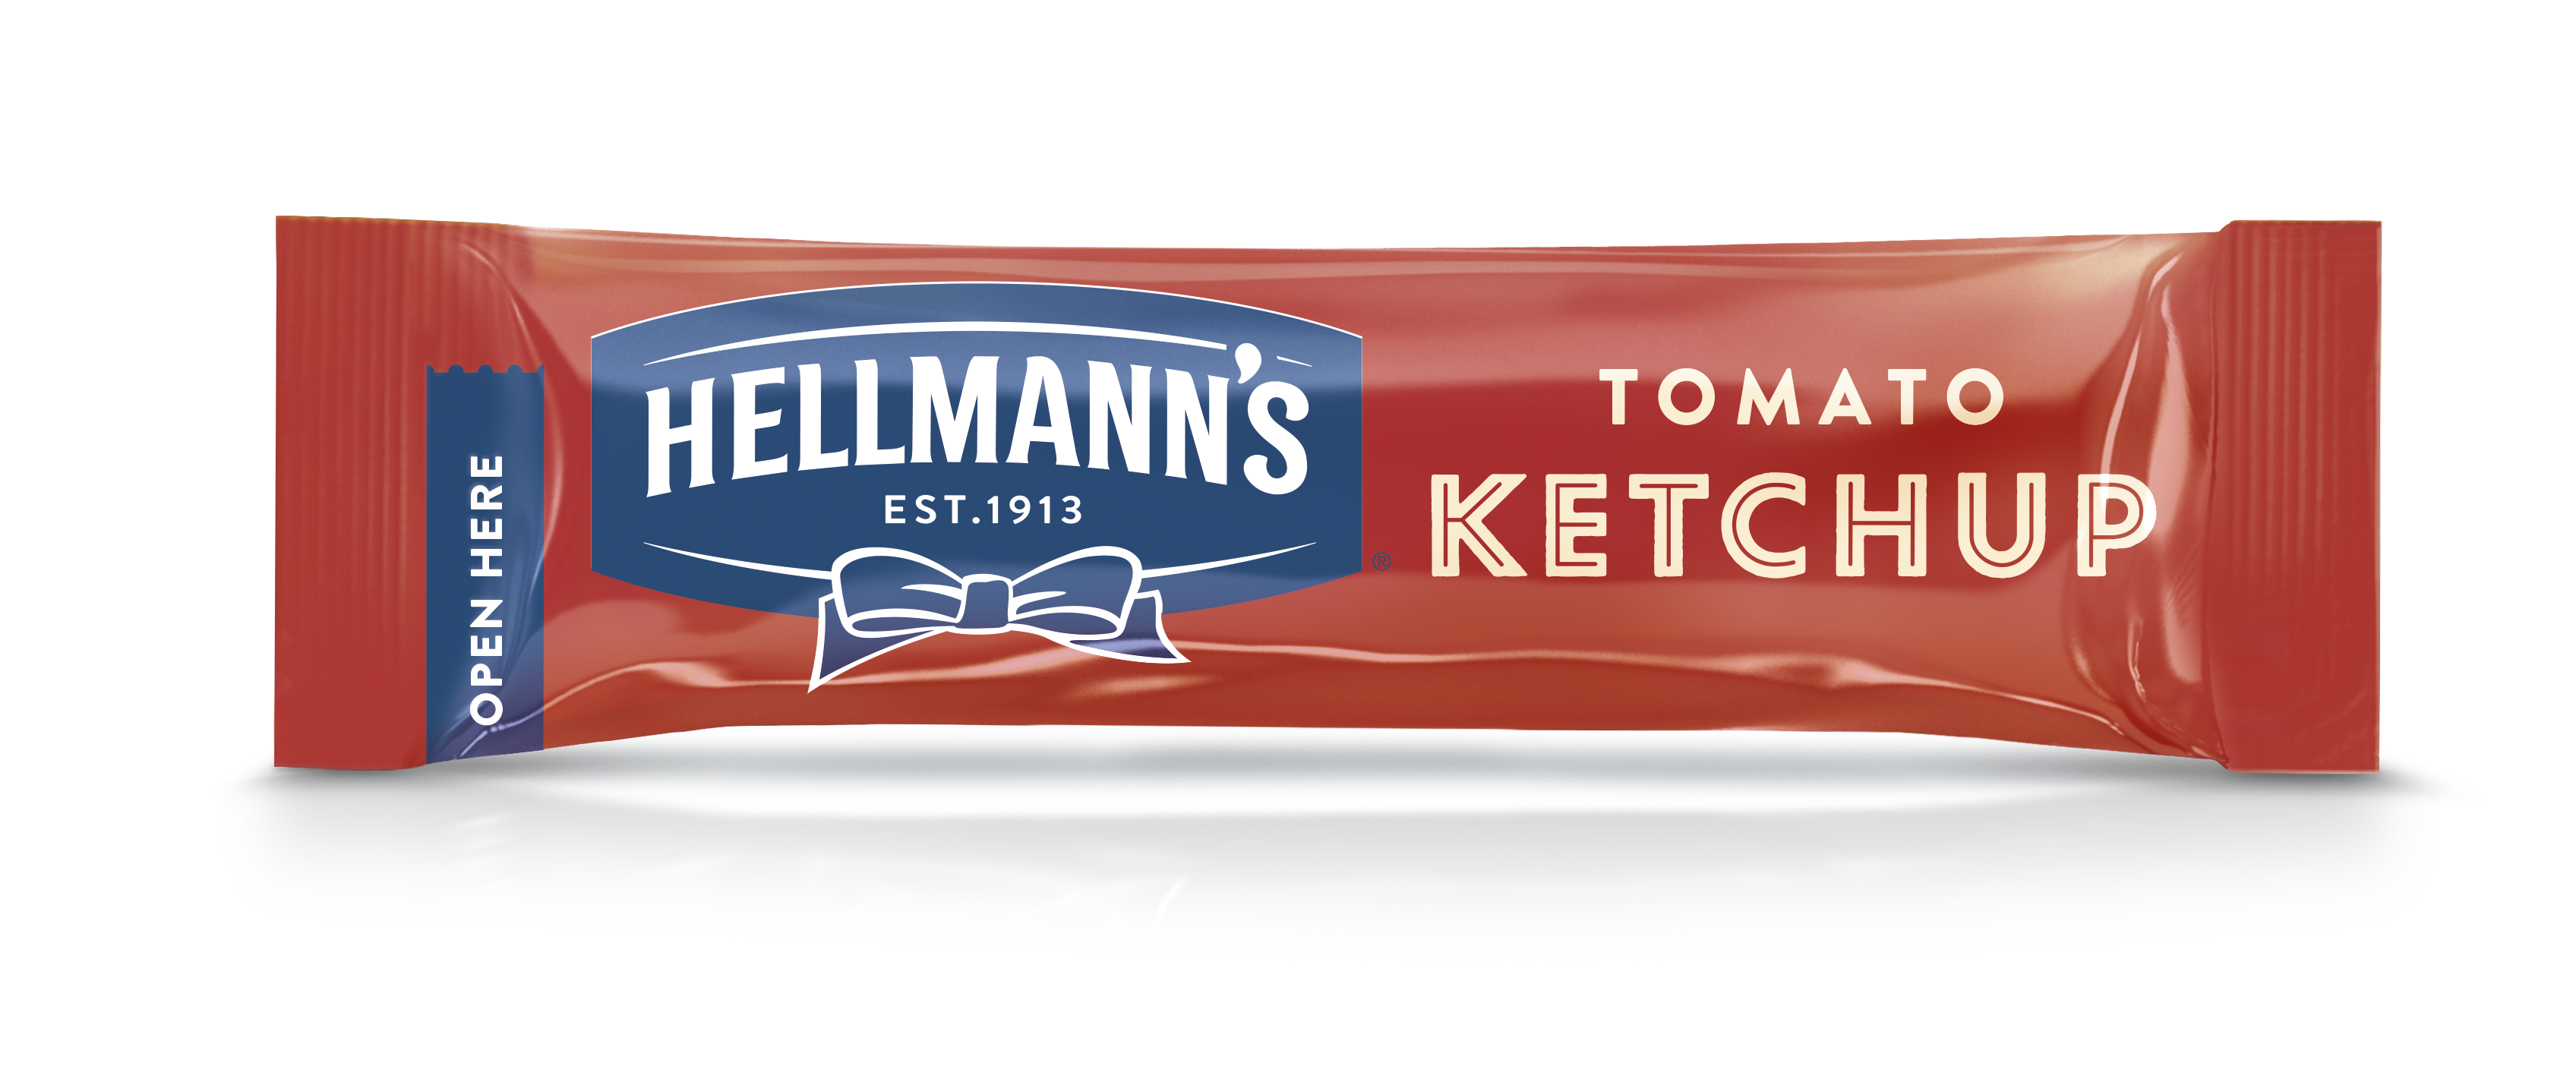 Hellmann's Tomato Ketchup Monodose 10 ml